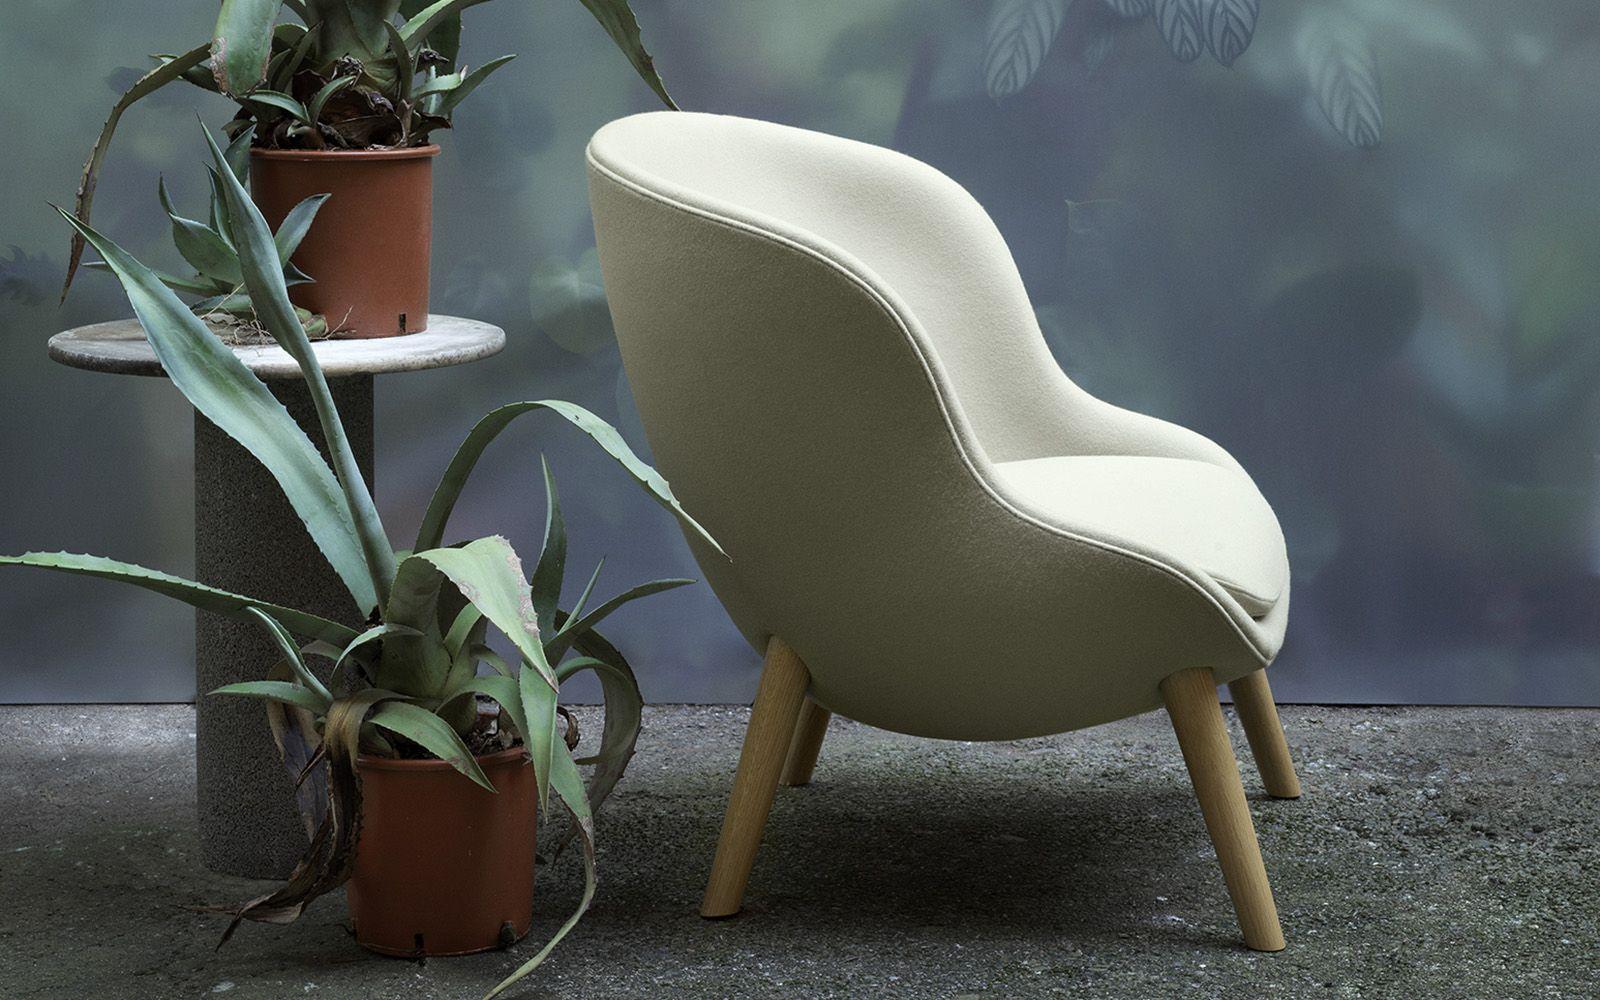 Remarkable The Perfect Match Hyg Lounge Chair Normann Copenhagen Camellatalisay Diy Chair Ideas Camellatalisaycom